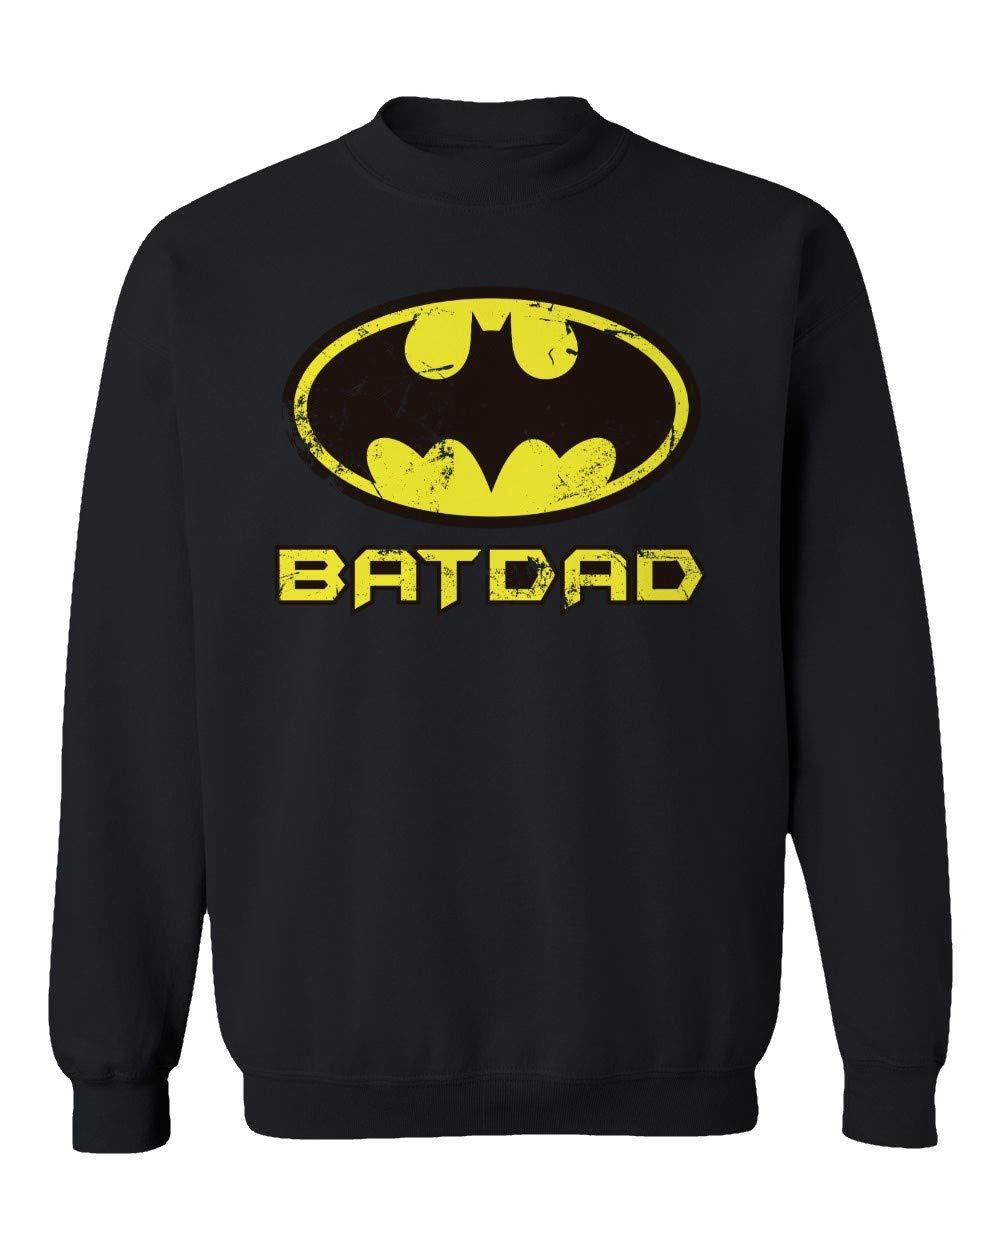 Bat Dad Batman Sweater Unisex Crewneck Shirts